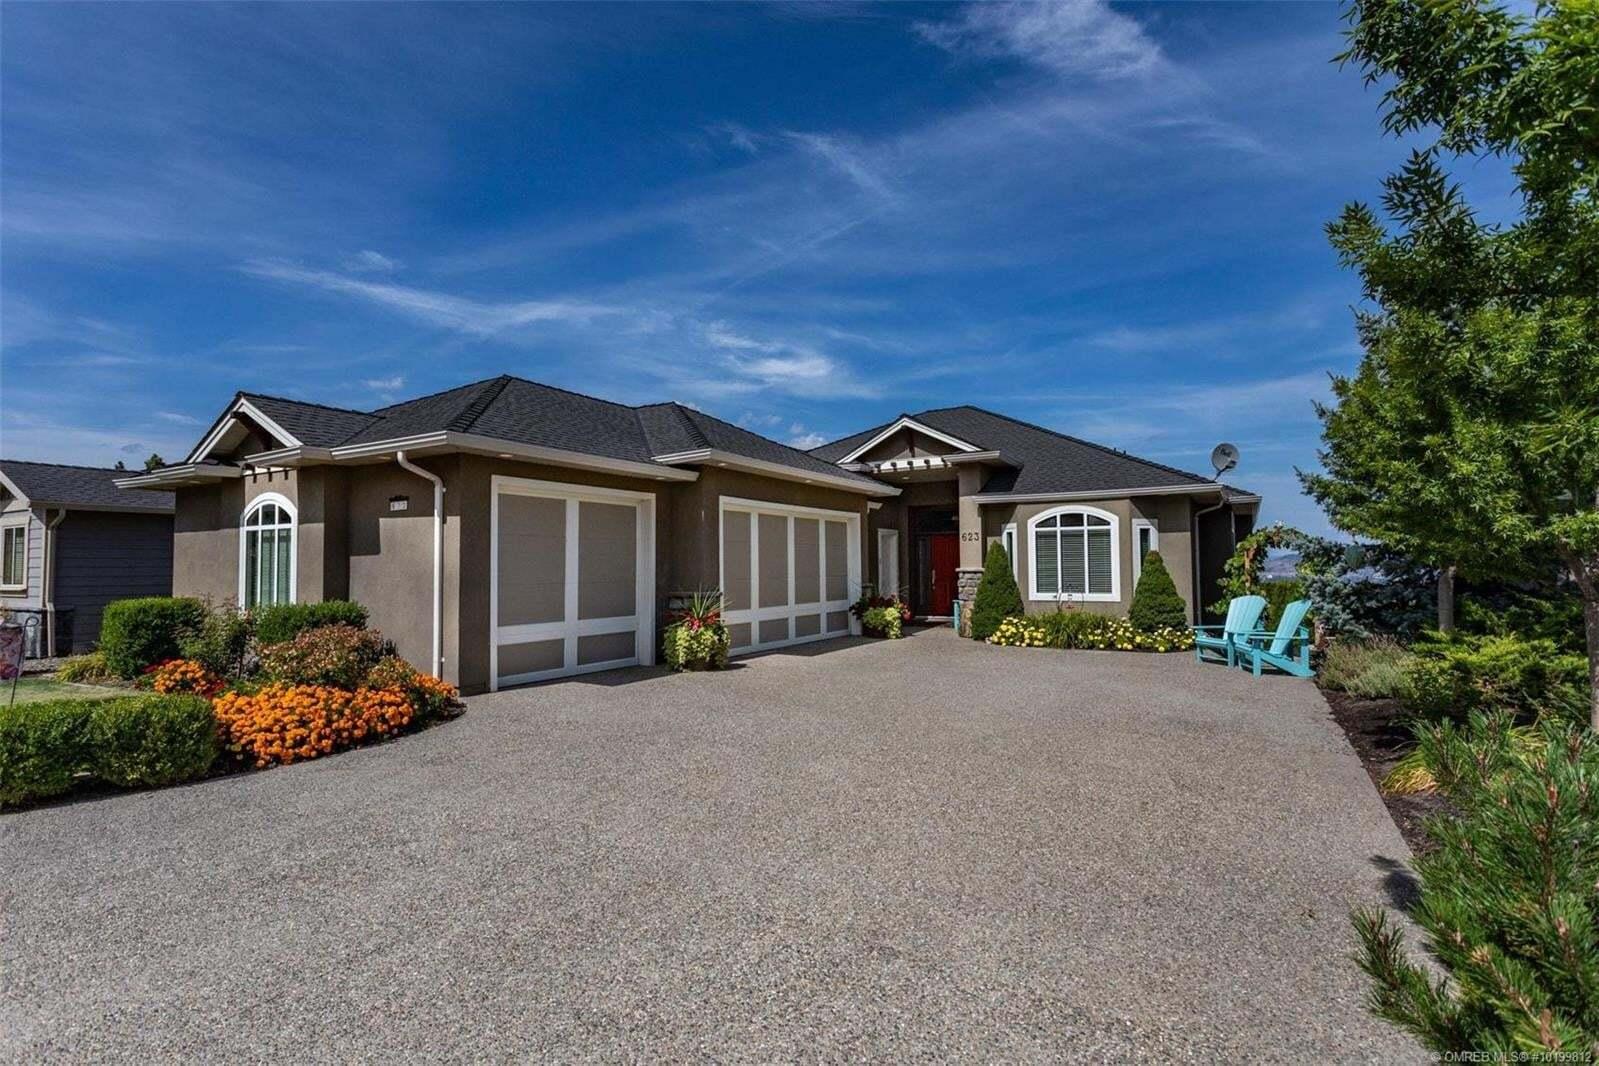 House for sale at 623 Arbor View Dr Kelowna British Columbia - MLS: 10199812